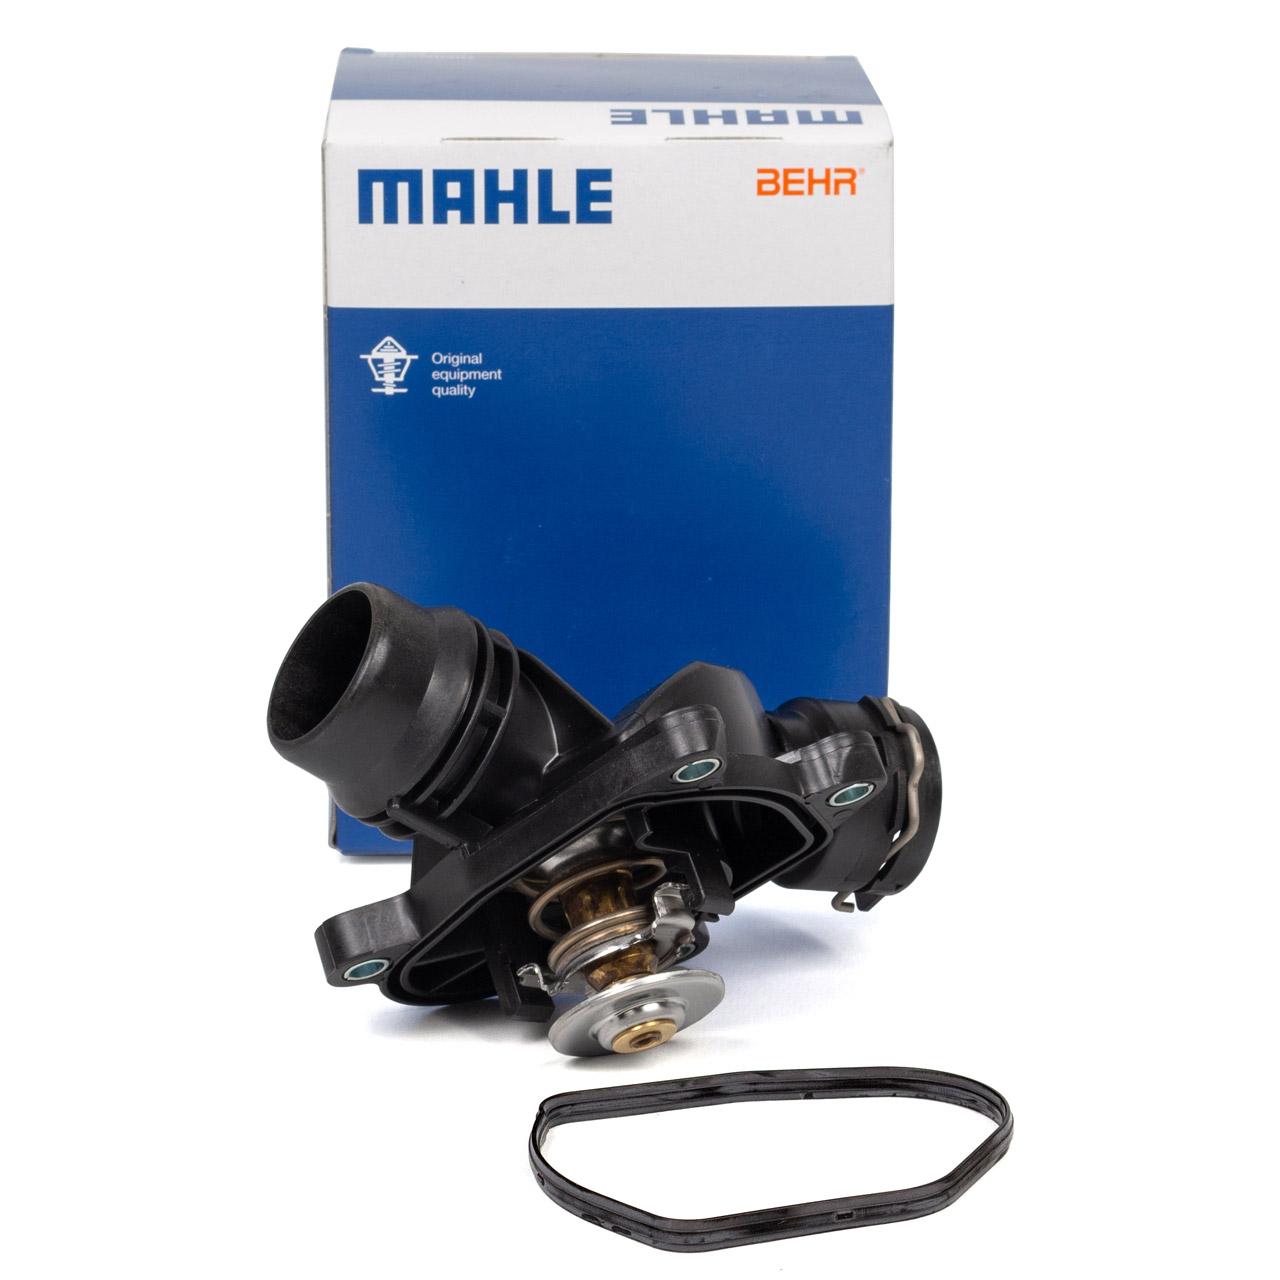 BEHR MAHLE TI23488 Thermostat + Gehäuse BMW E46 E90-93 E60 E61 X3 X5 N47 M47 M57